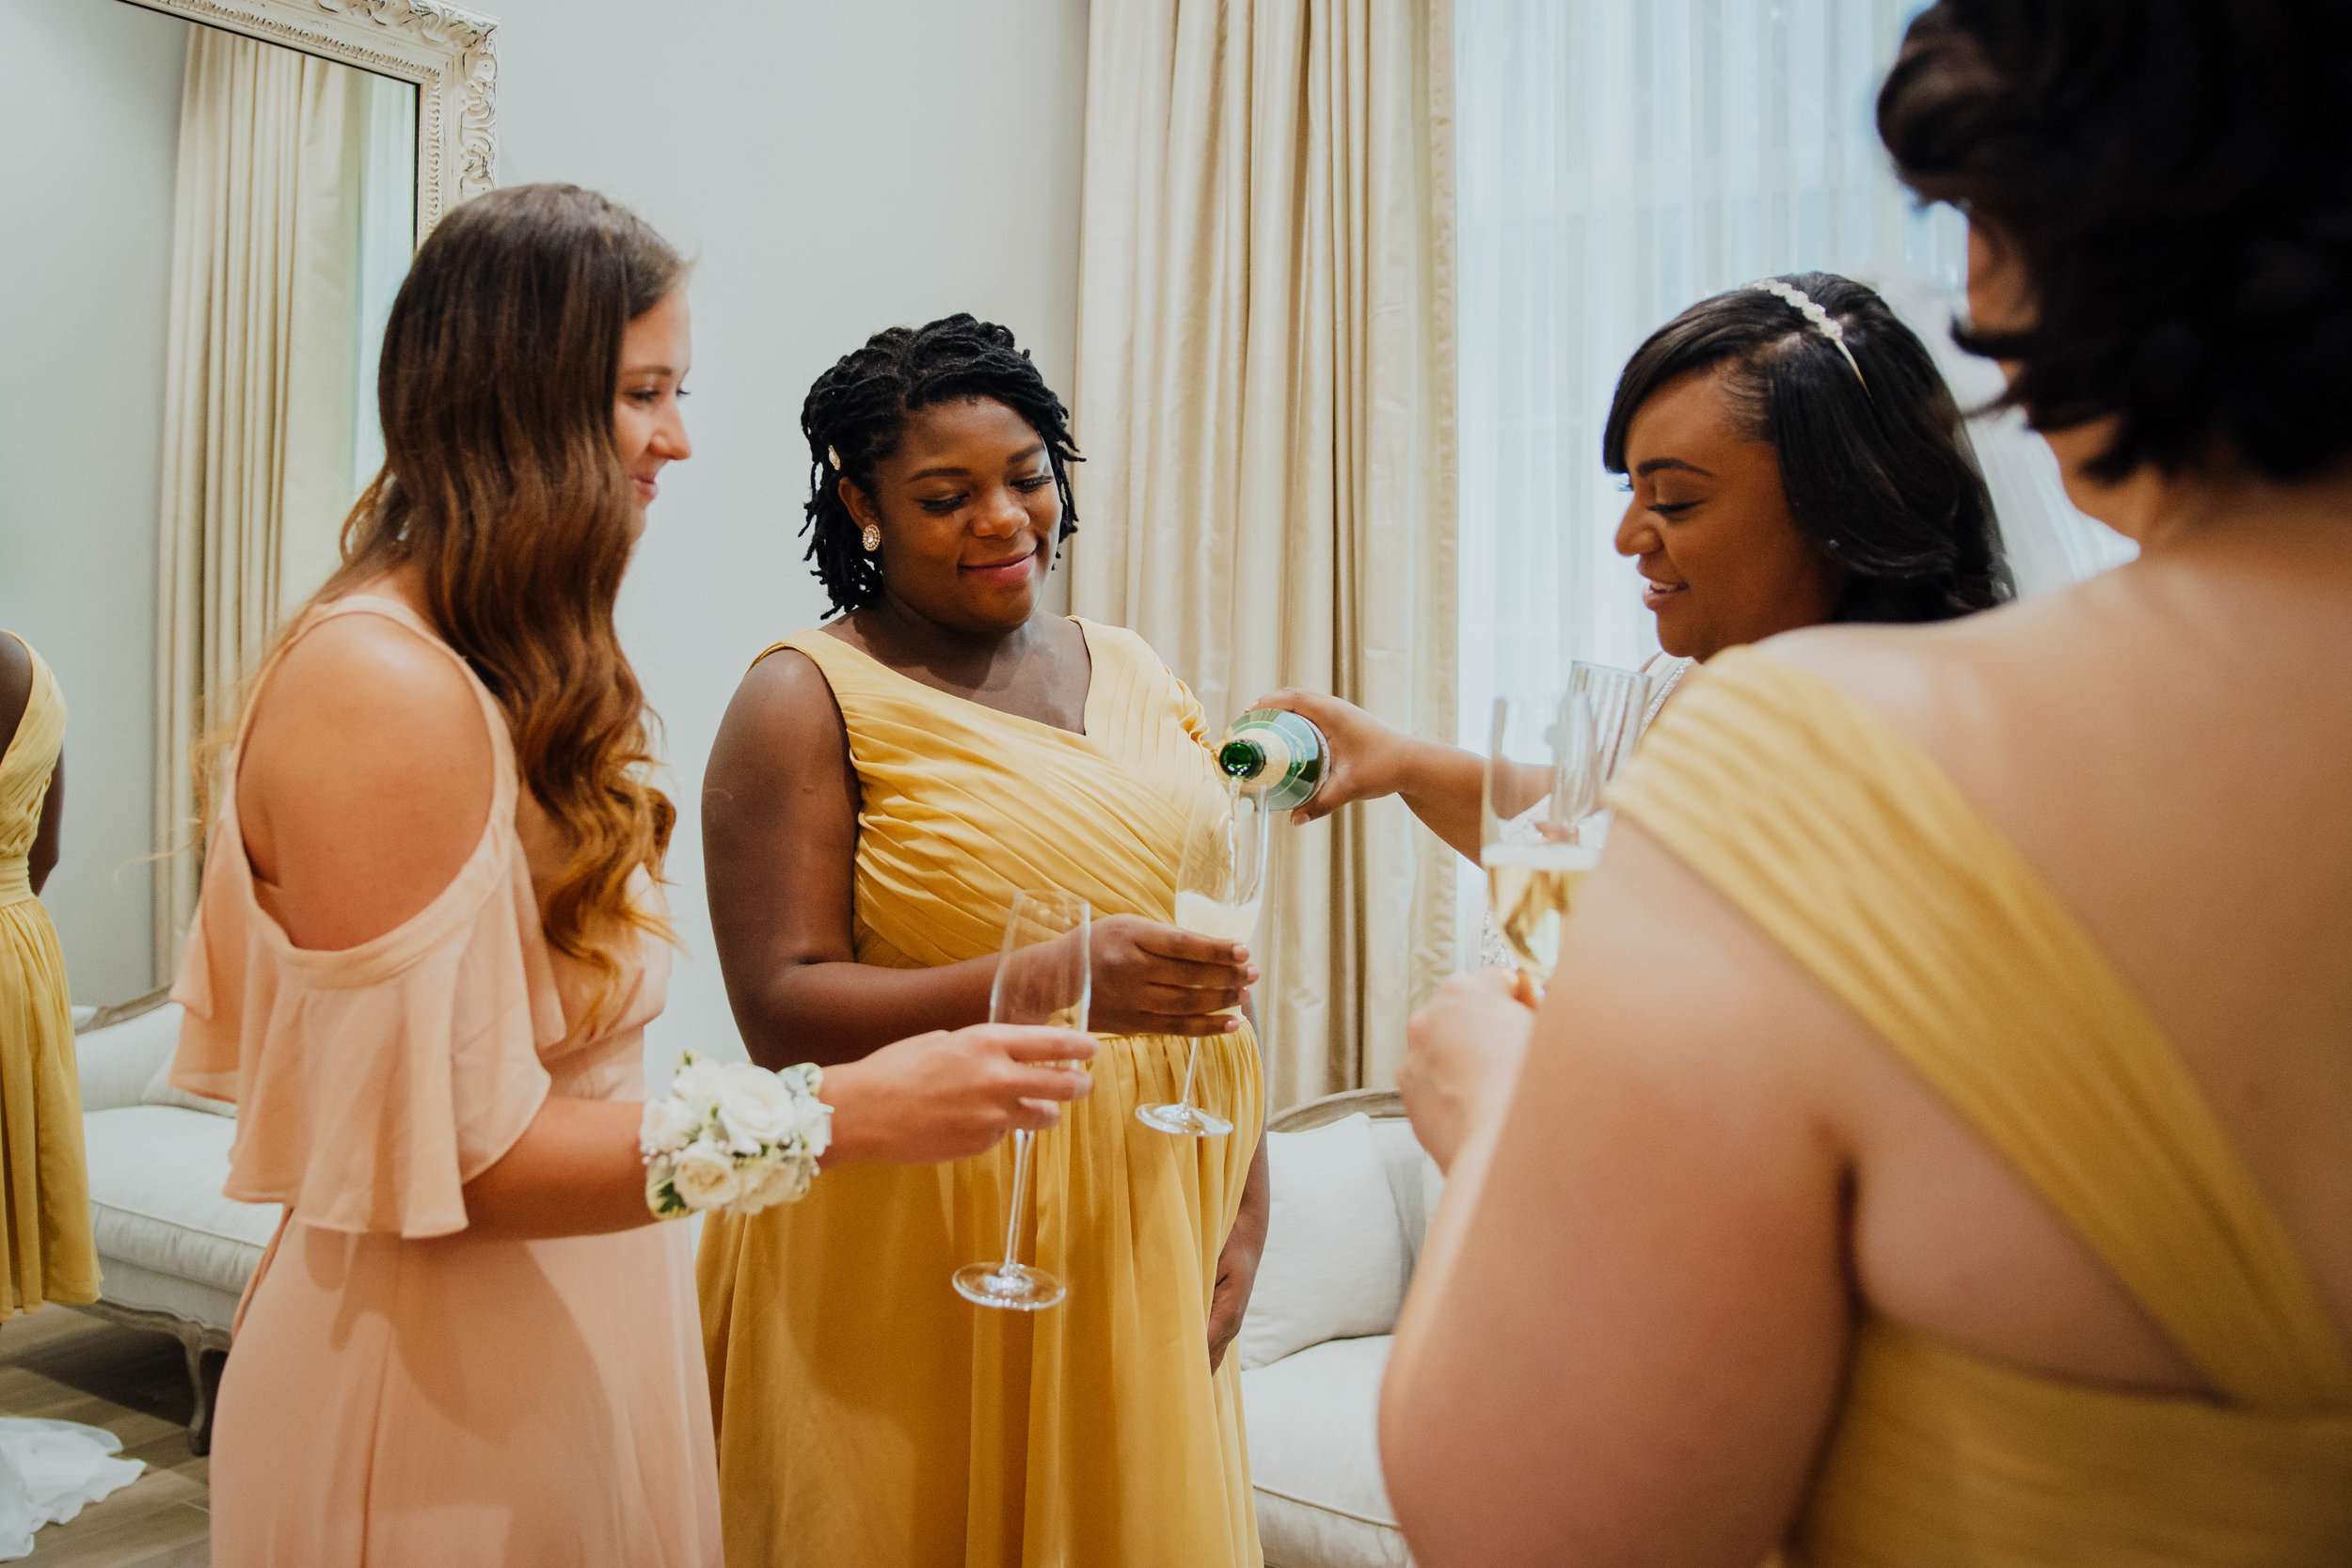 McNeile_Photography_Wedding_Tampa16.jpg